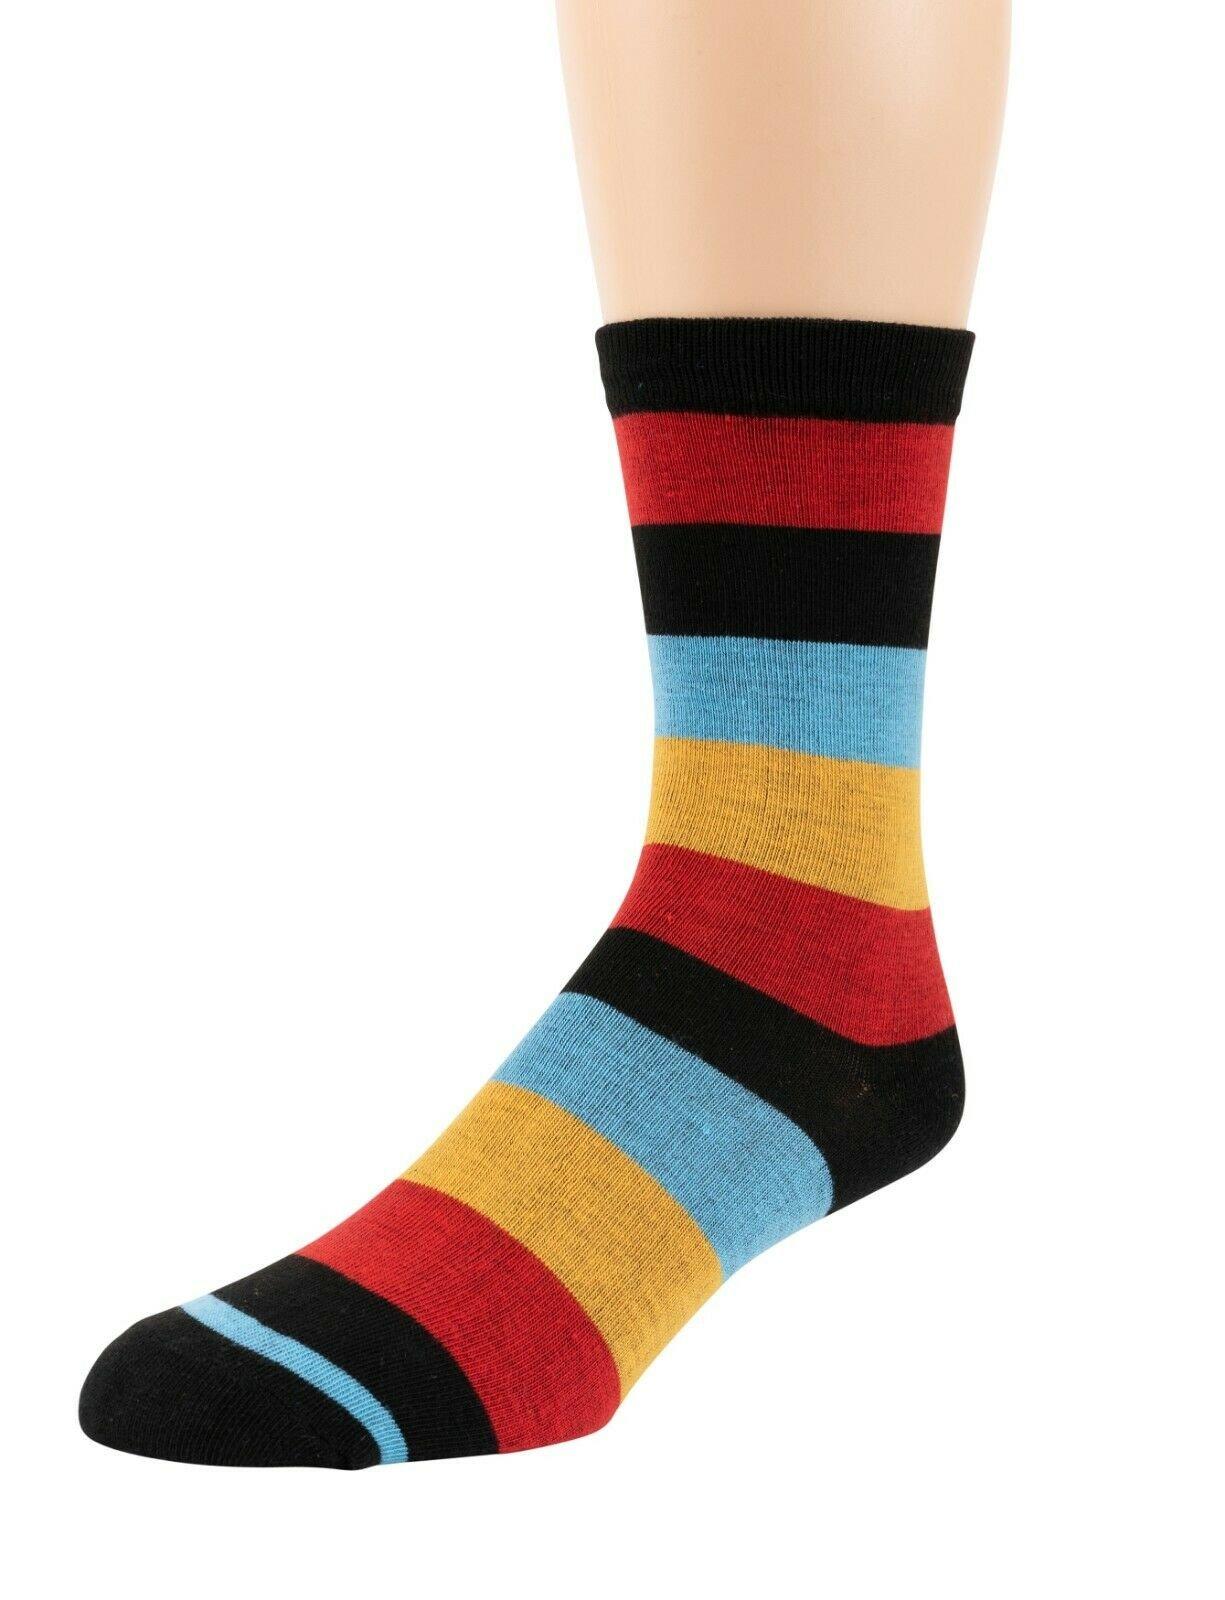 Mitch-Bogen-Mens-Cotton-Dress-Socks-Colorful-Fashion-Crew-Socks-8-Pack-Gift-Box thumbnail 13